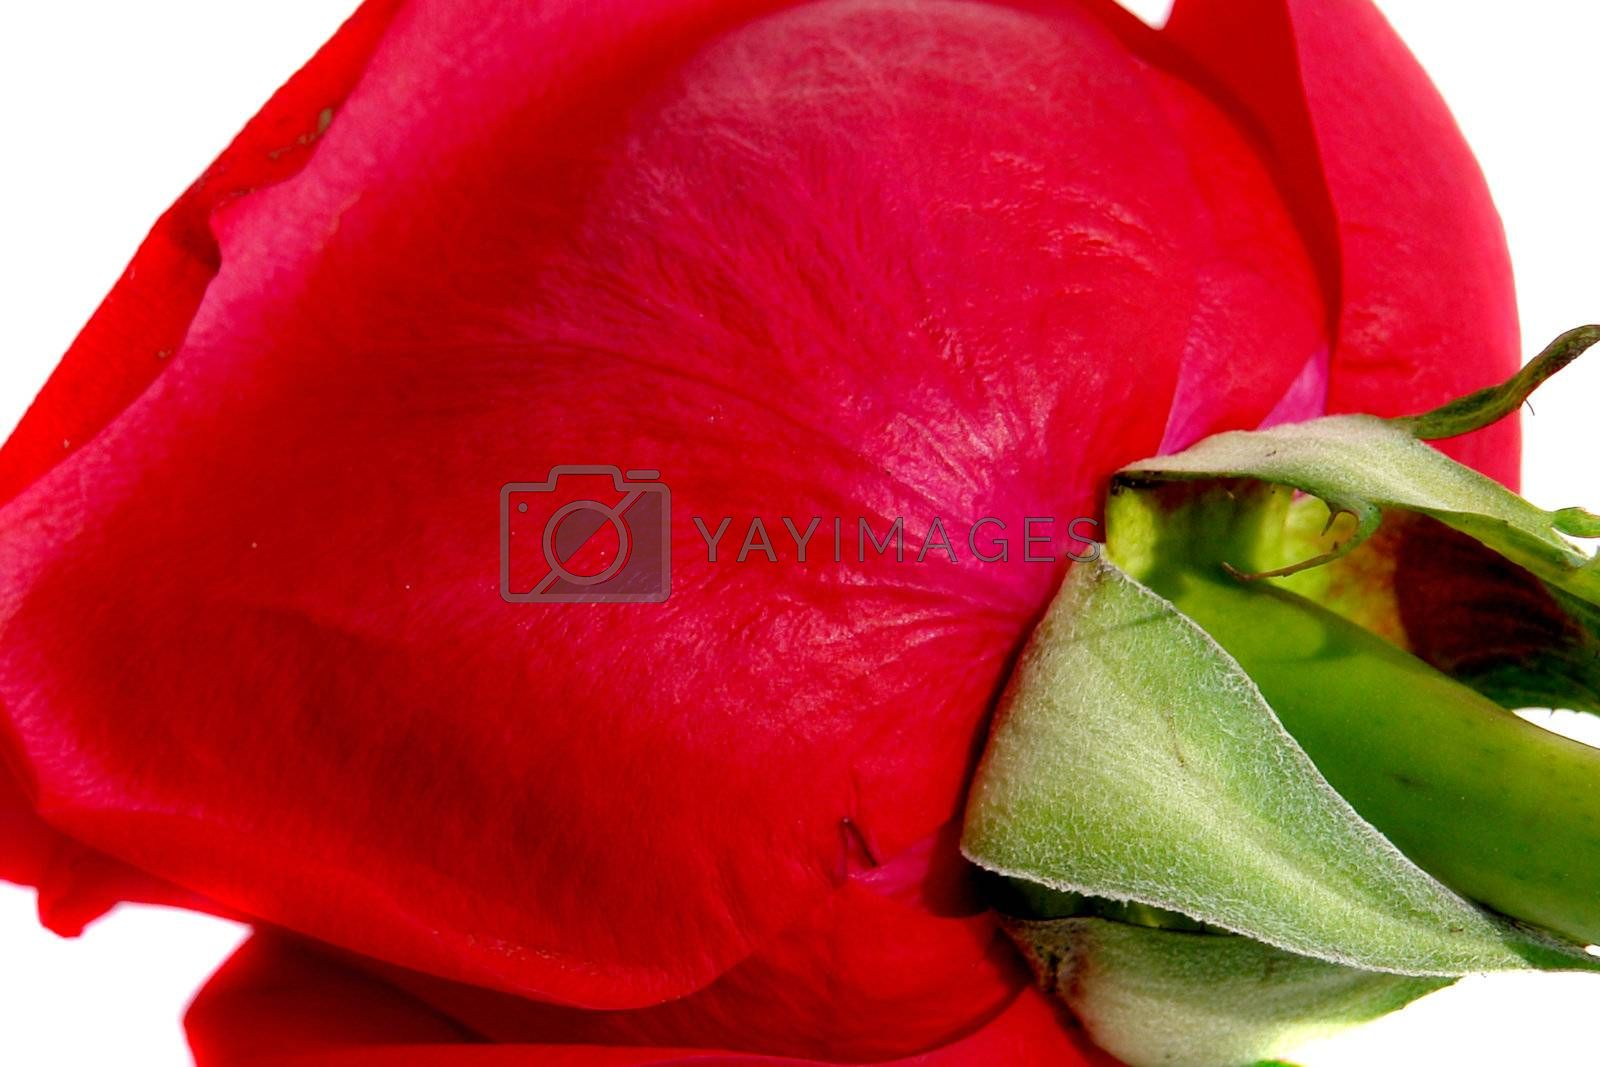 back red rose on white background, isolated image